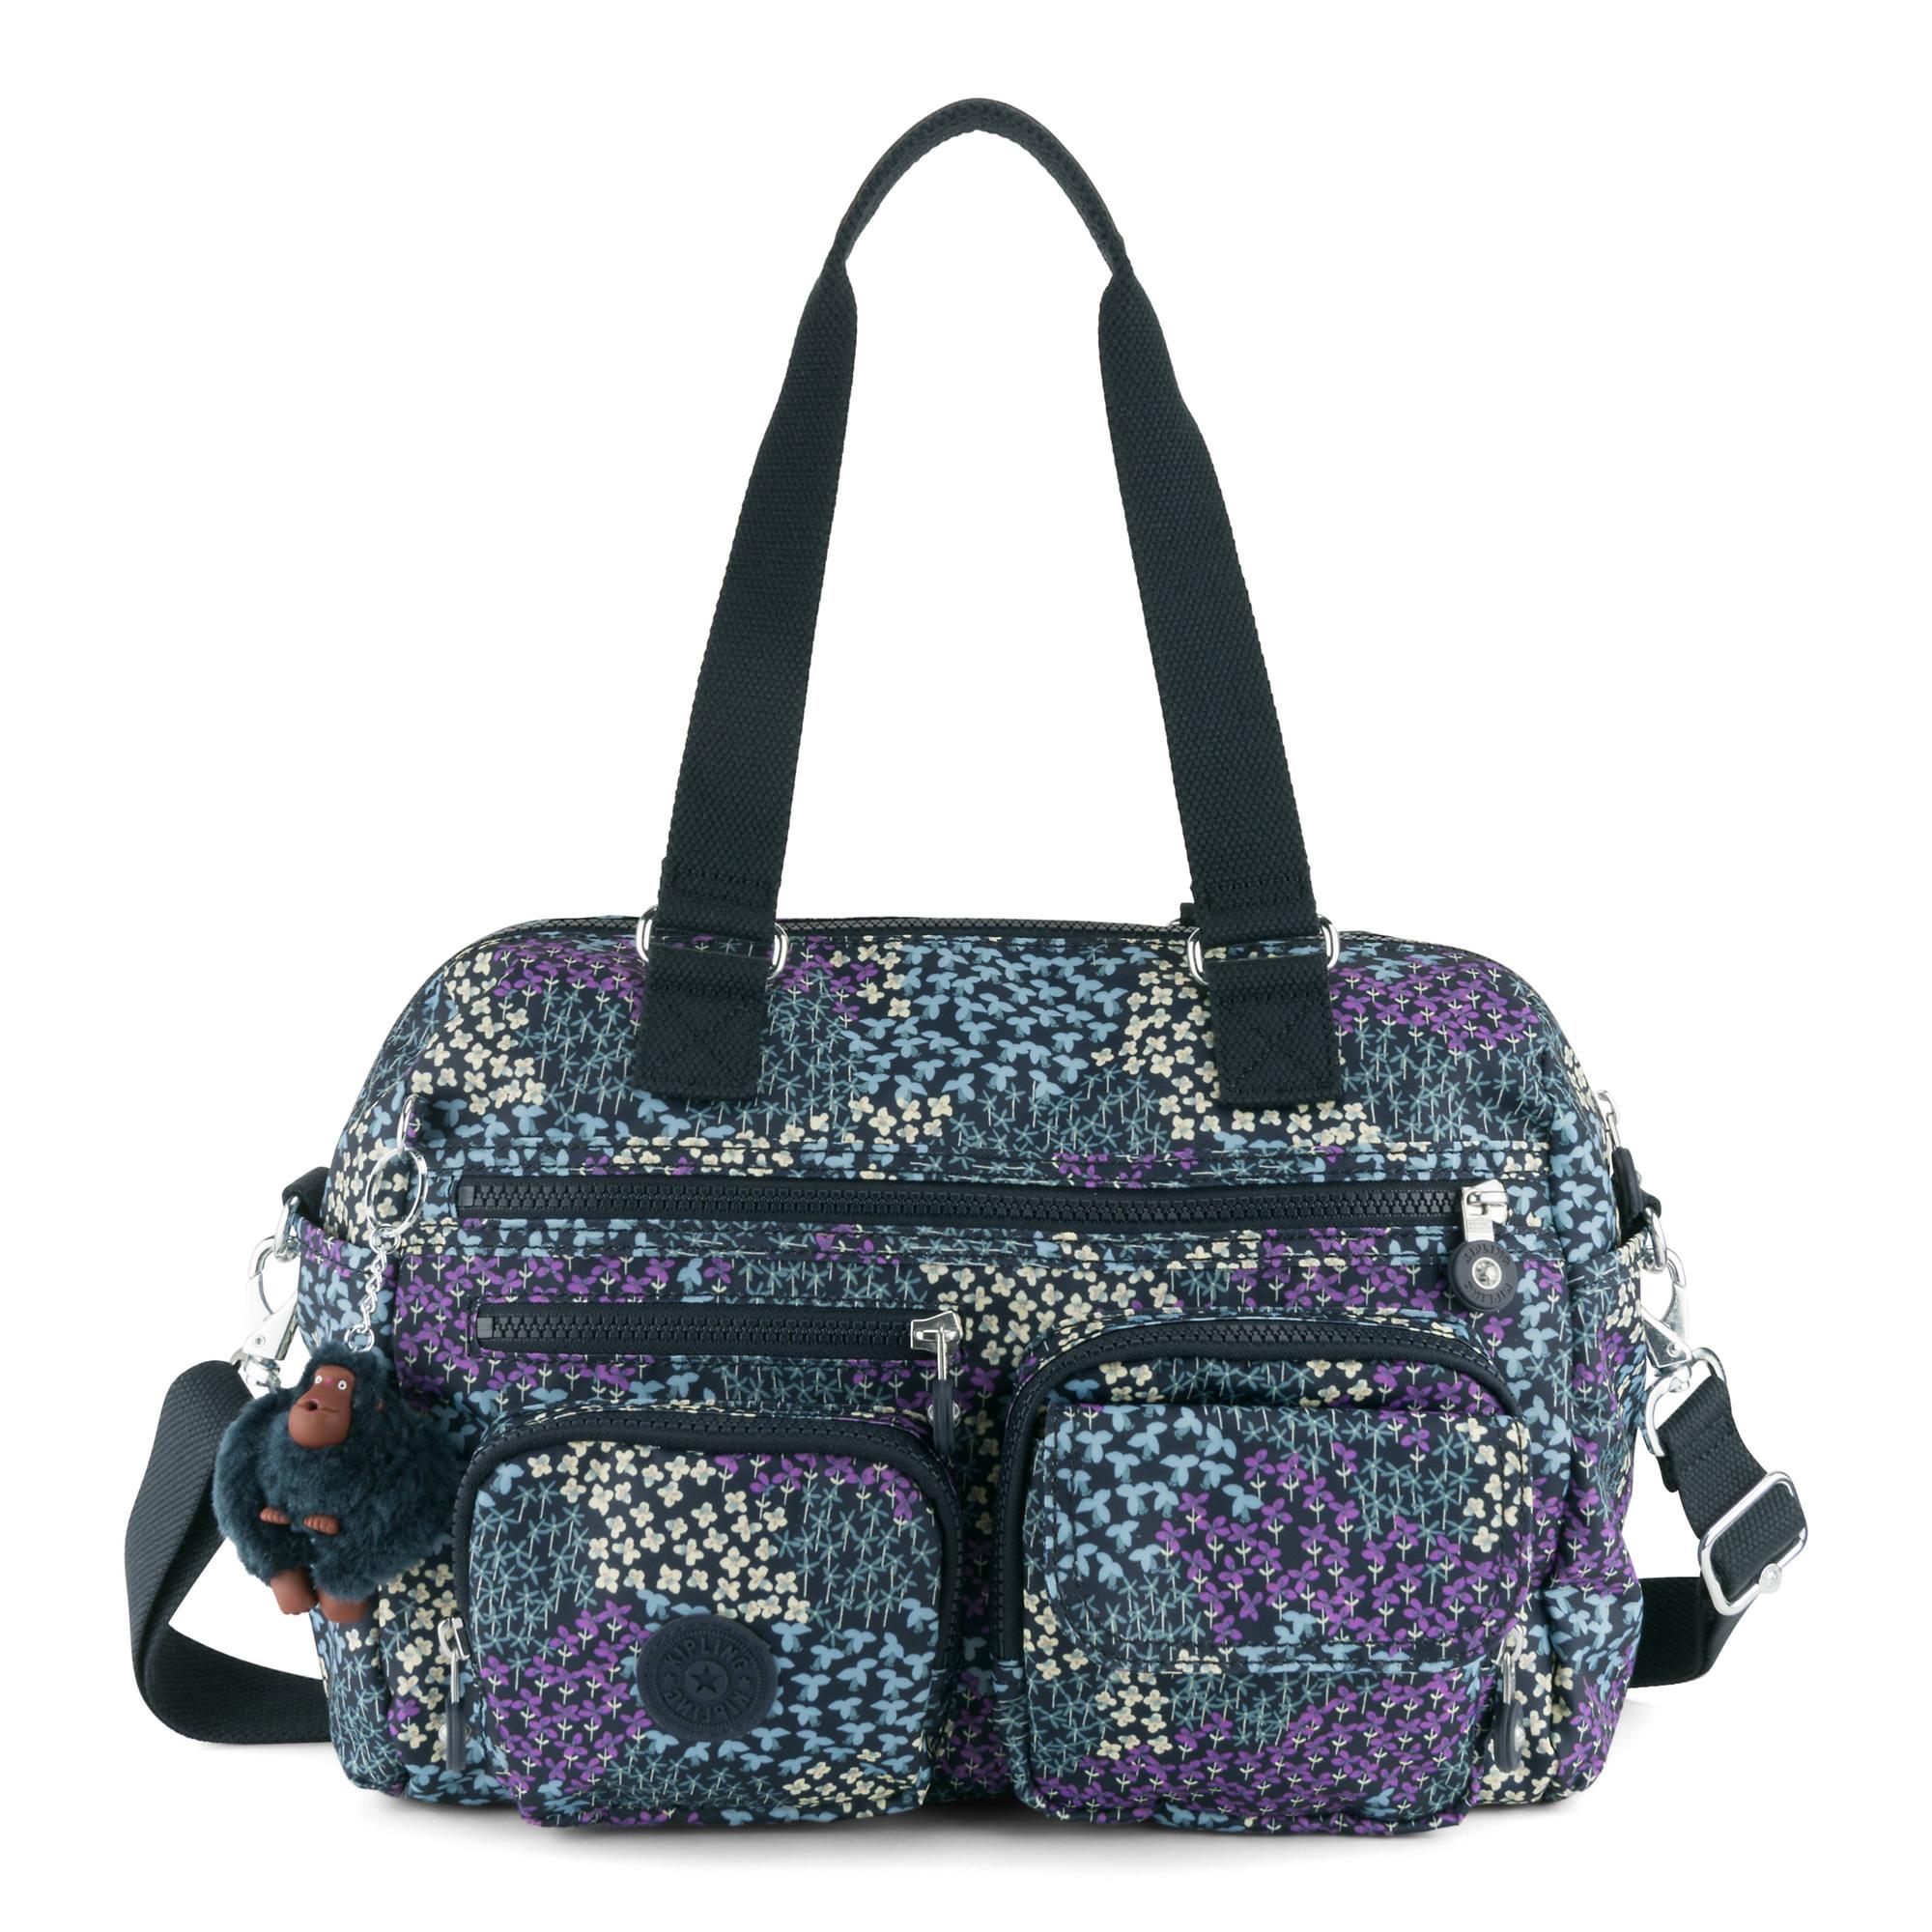 Mara Printed Handbag Kipling